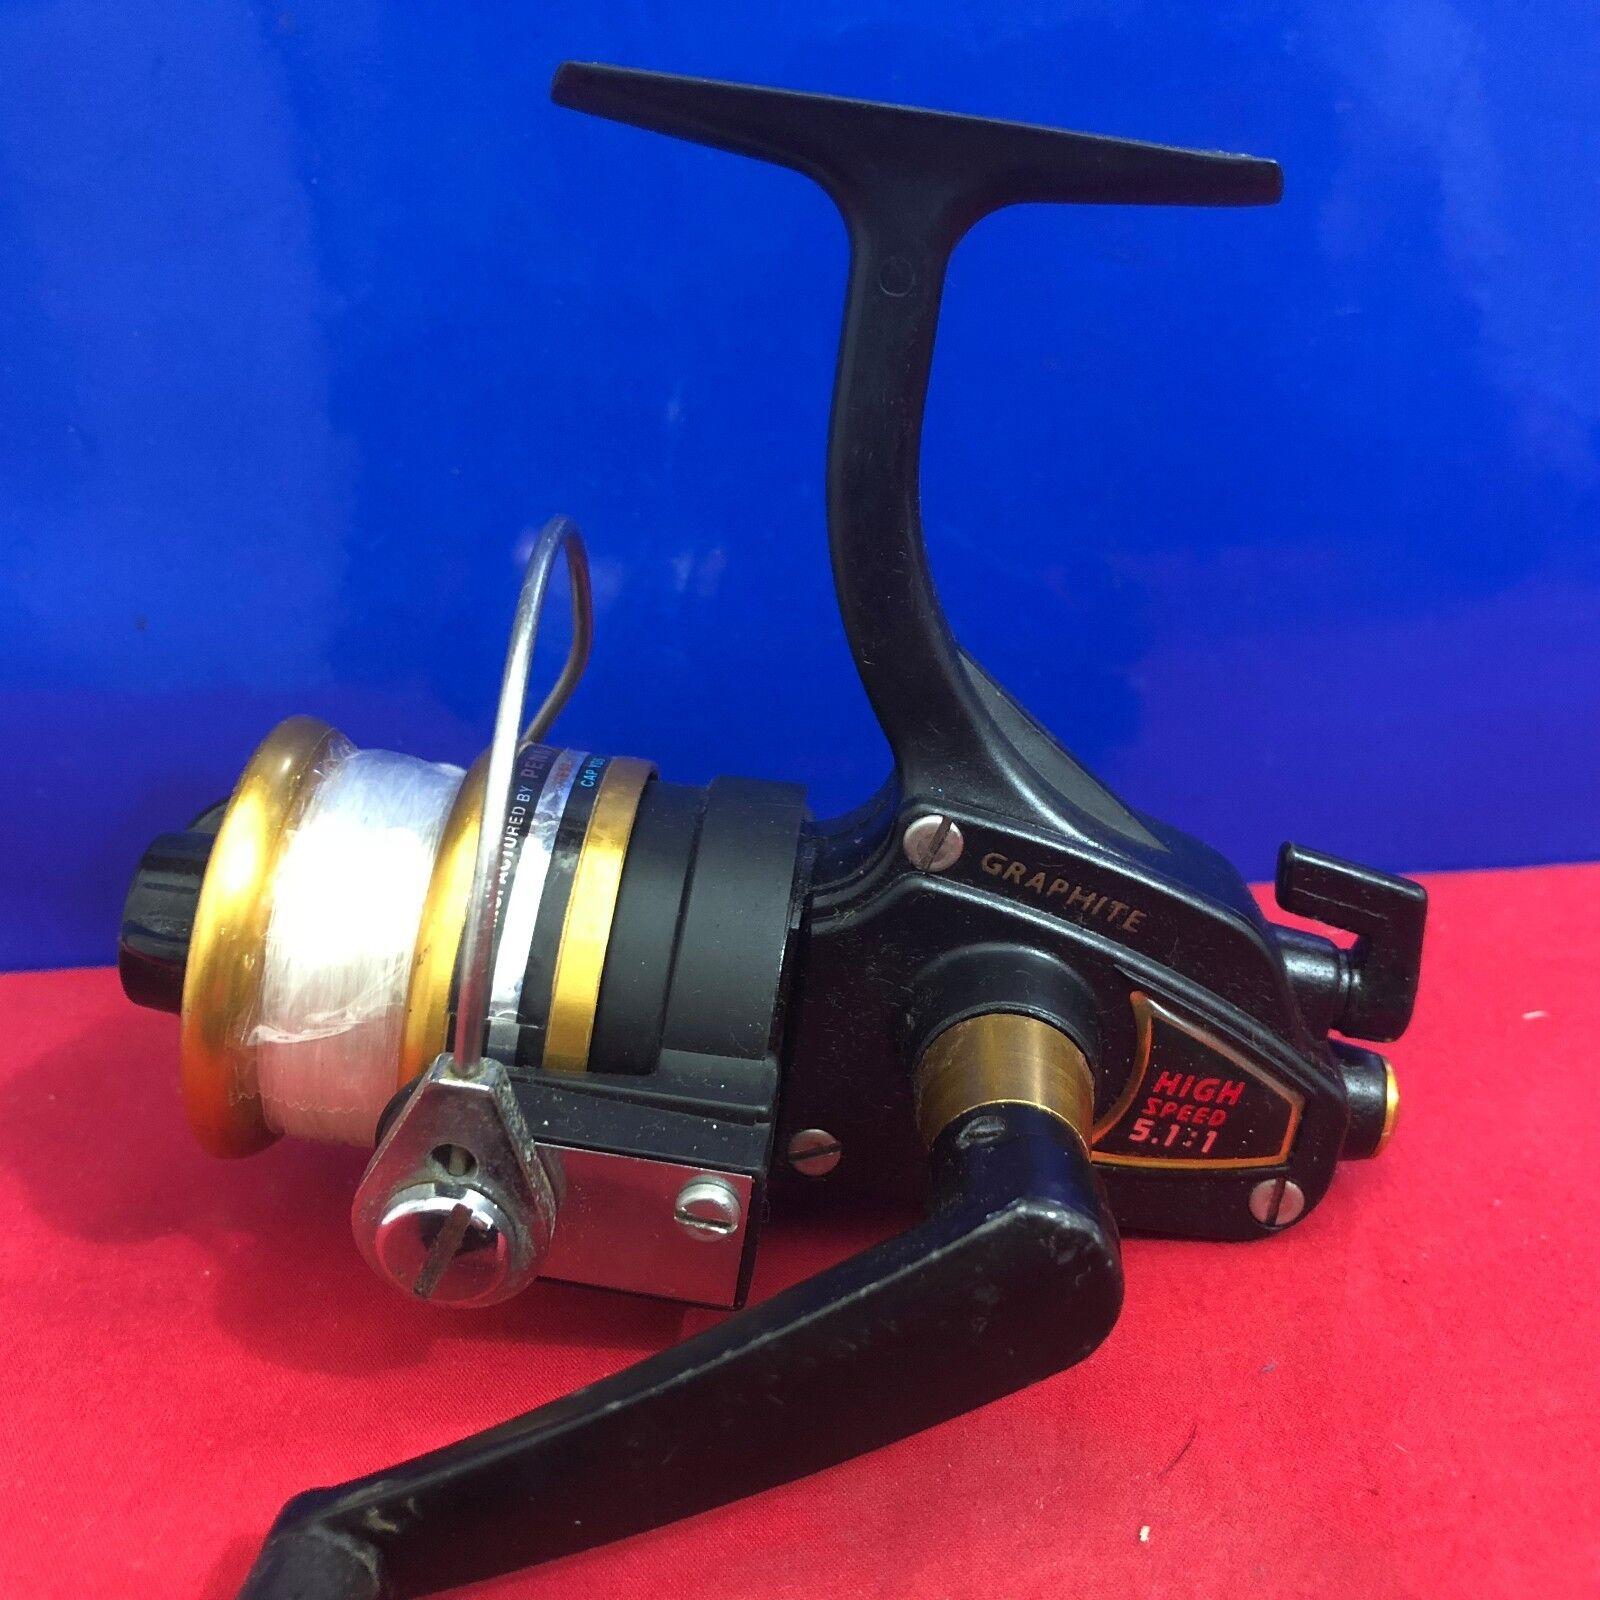 Penn High Speed 4400SS Spinning Fishing Reel Z5